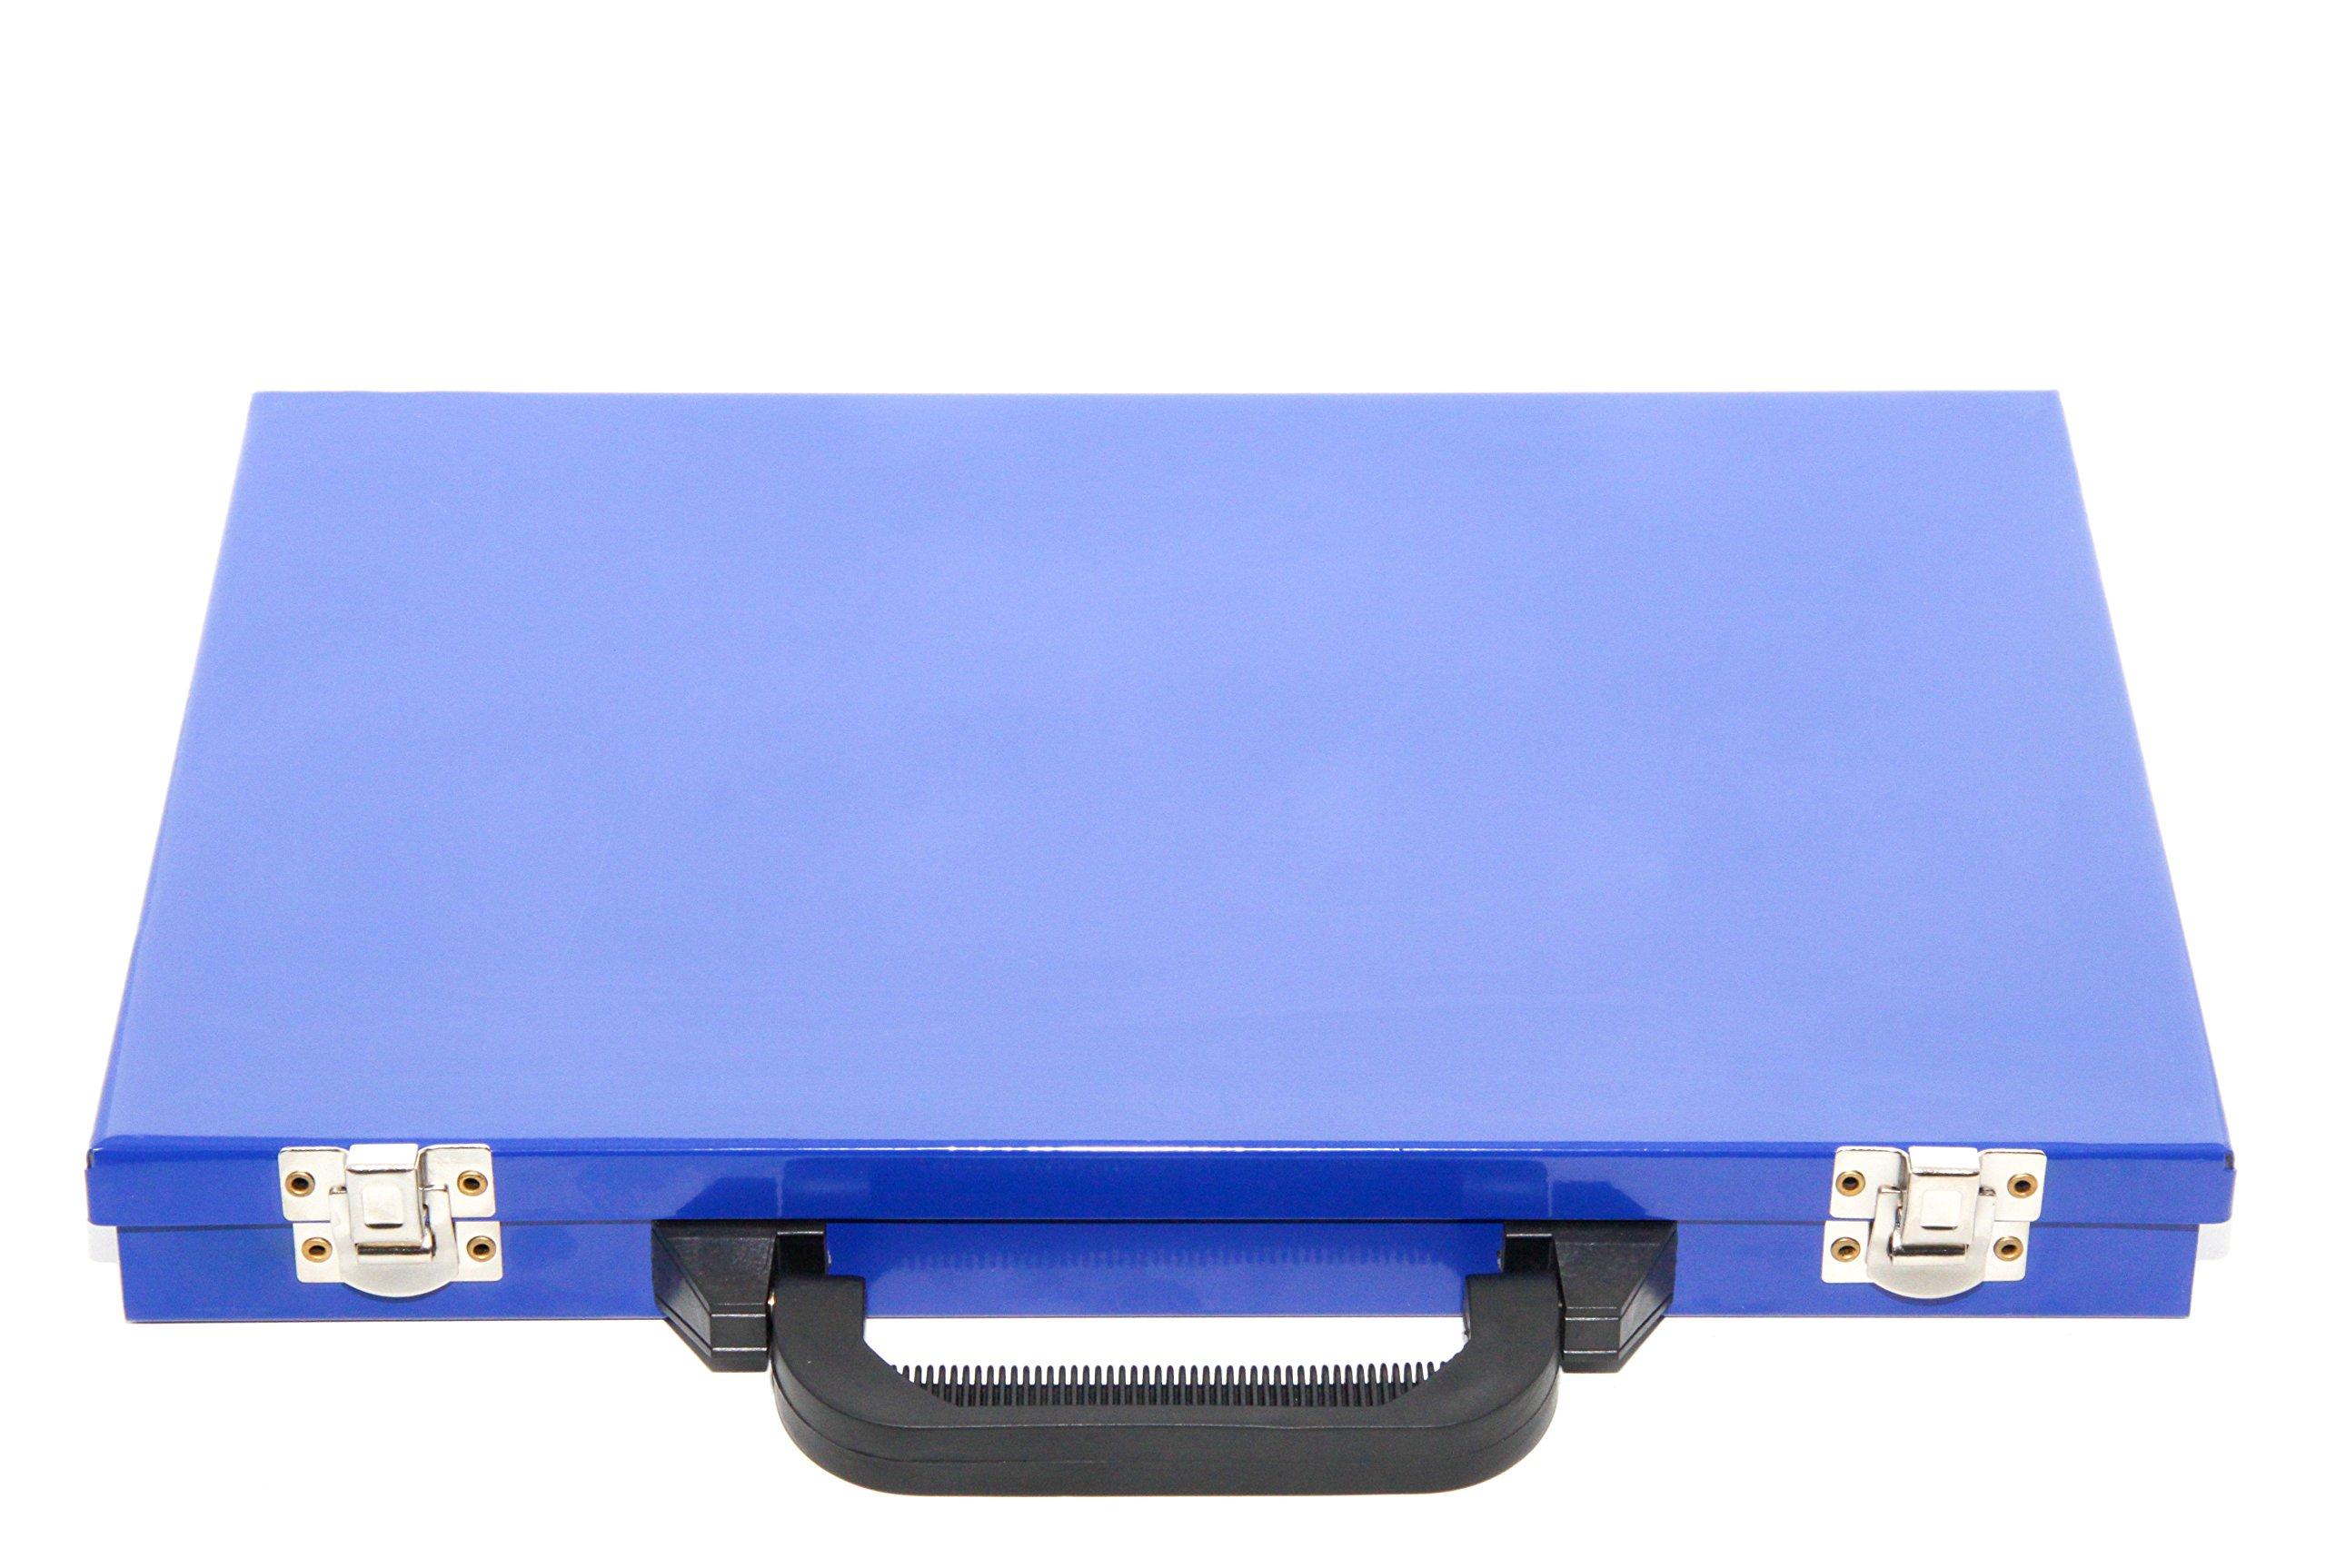 Bosch 2607010909 Tough Box For Jigsaw And Sabre Saw Blades Portable Case